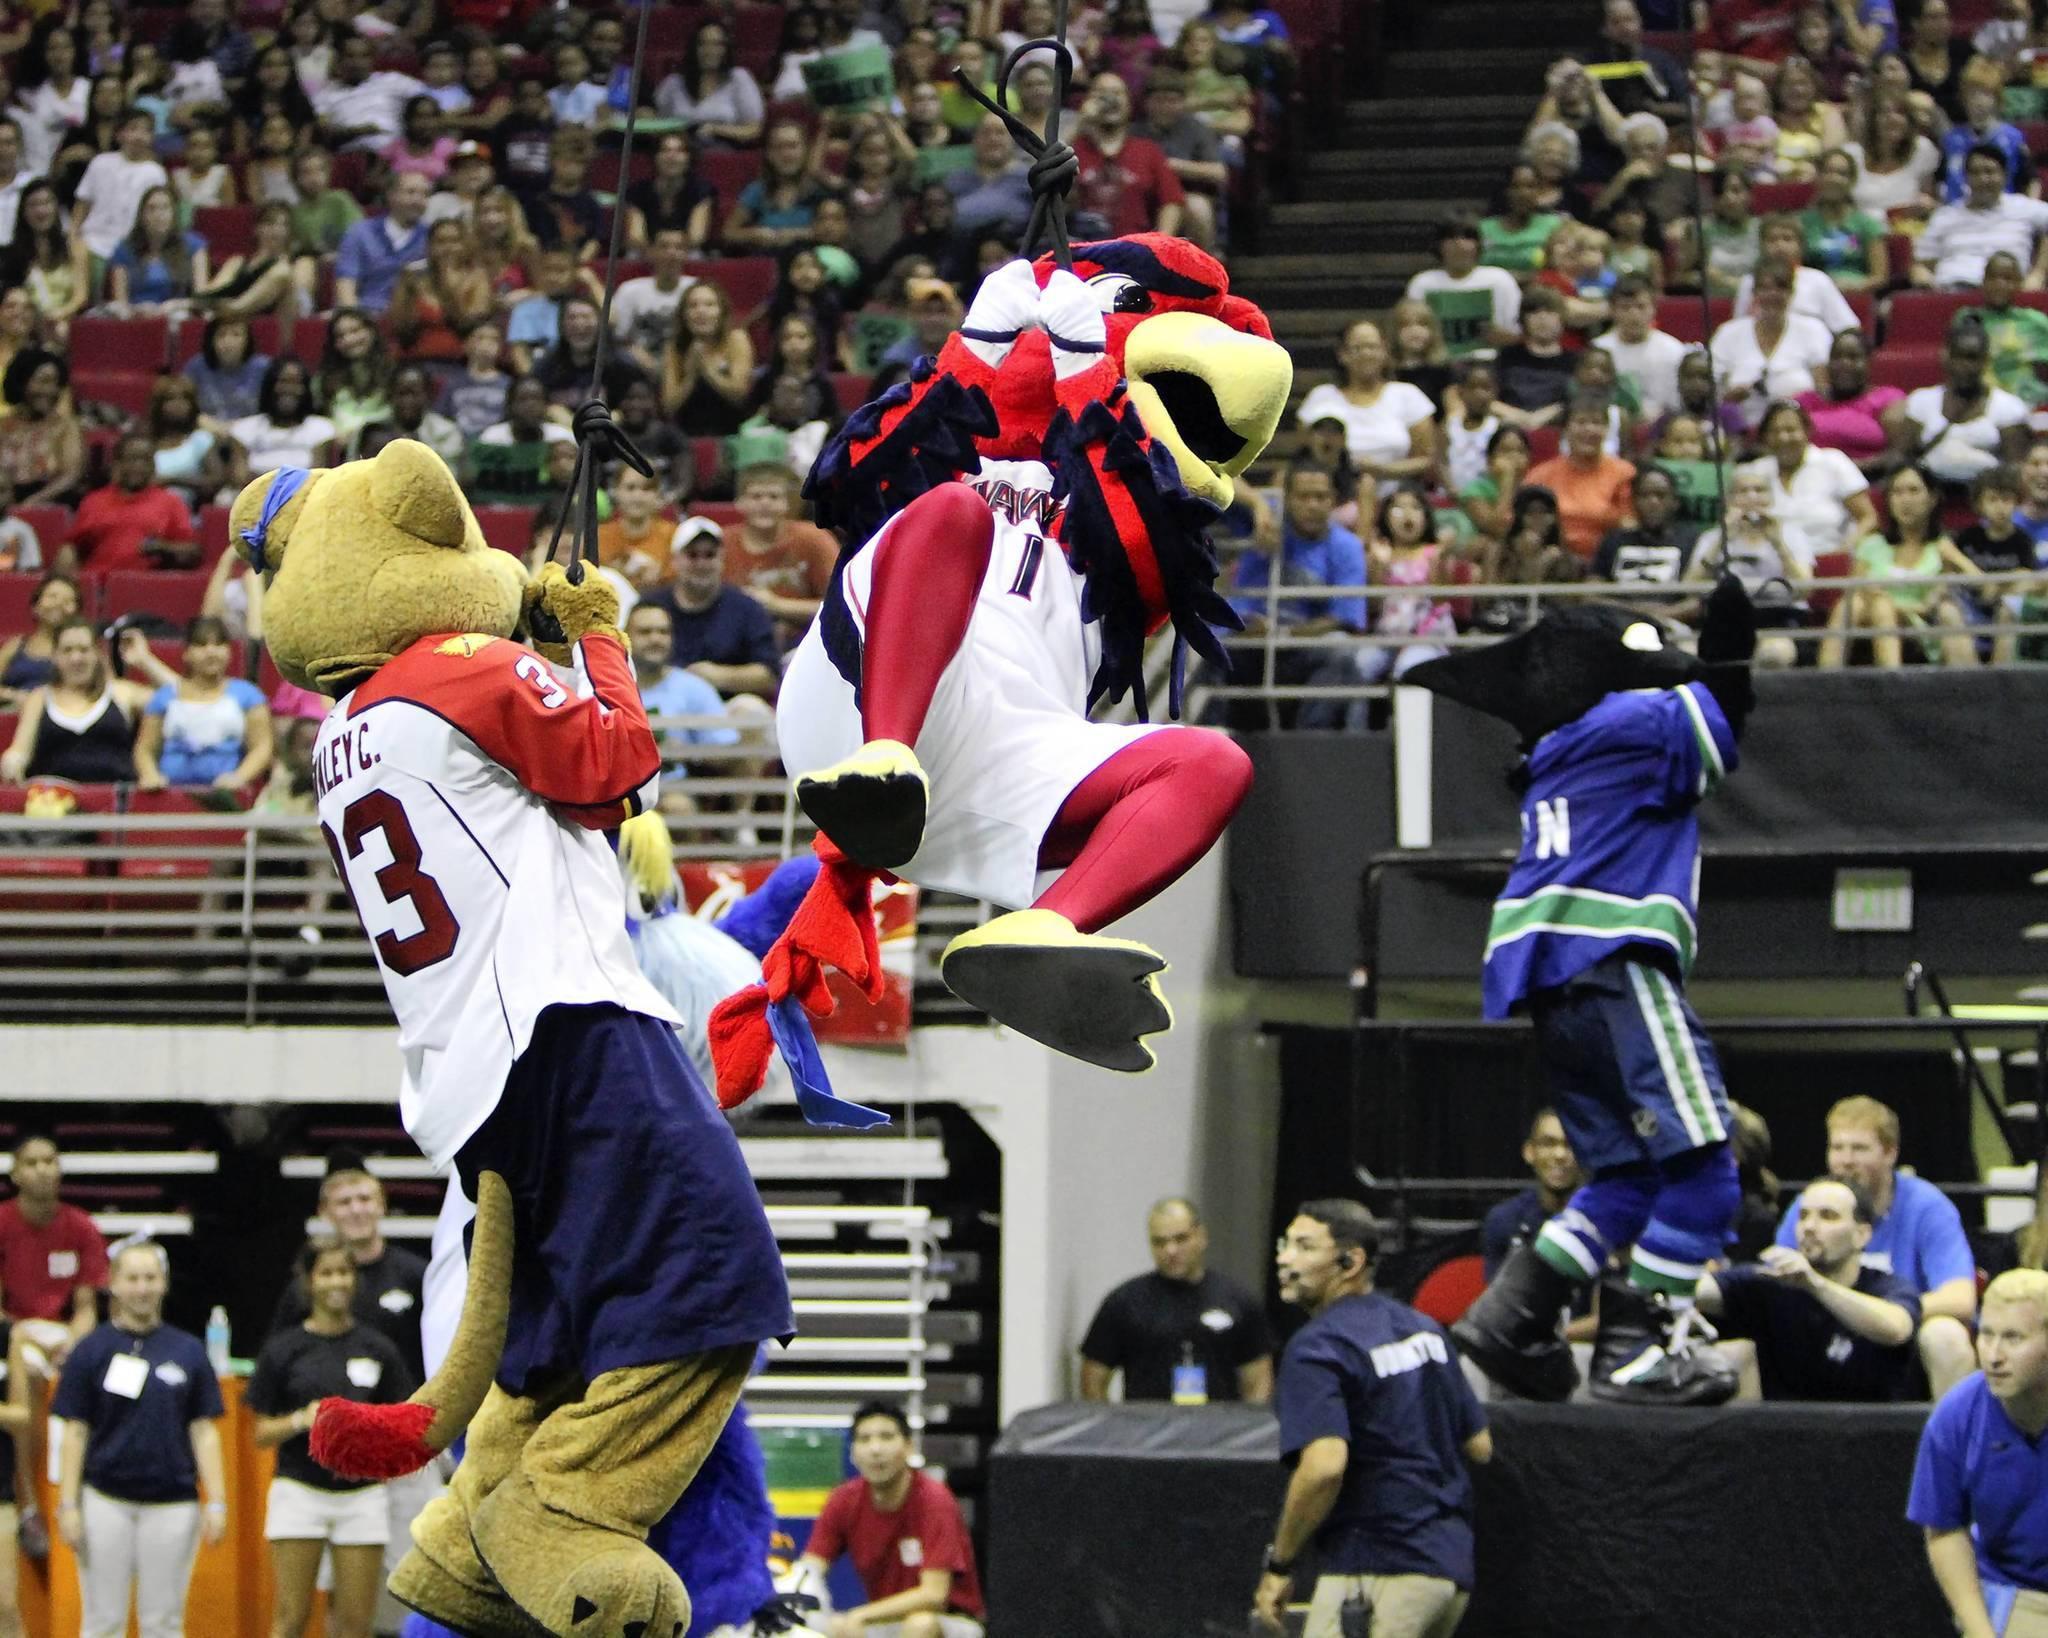 Celebrity Mascot Games At Amway Arena - Orlando, Florida ...